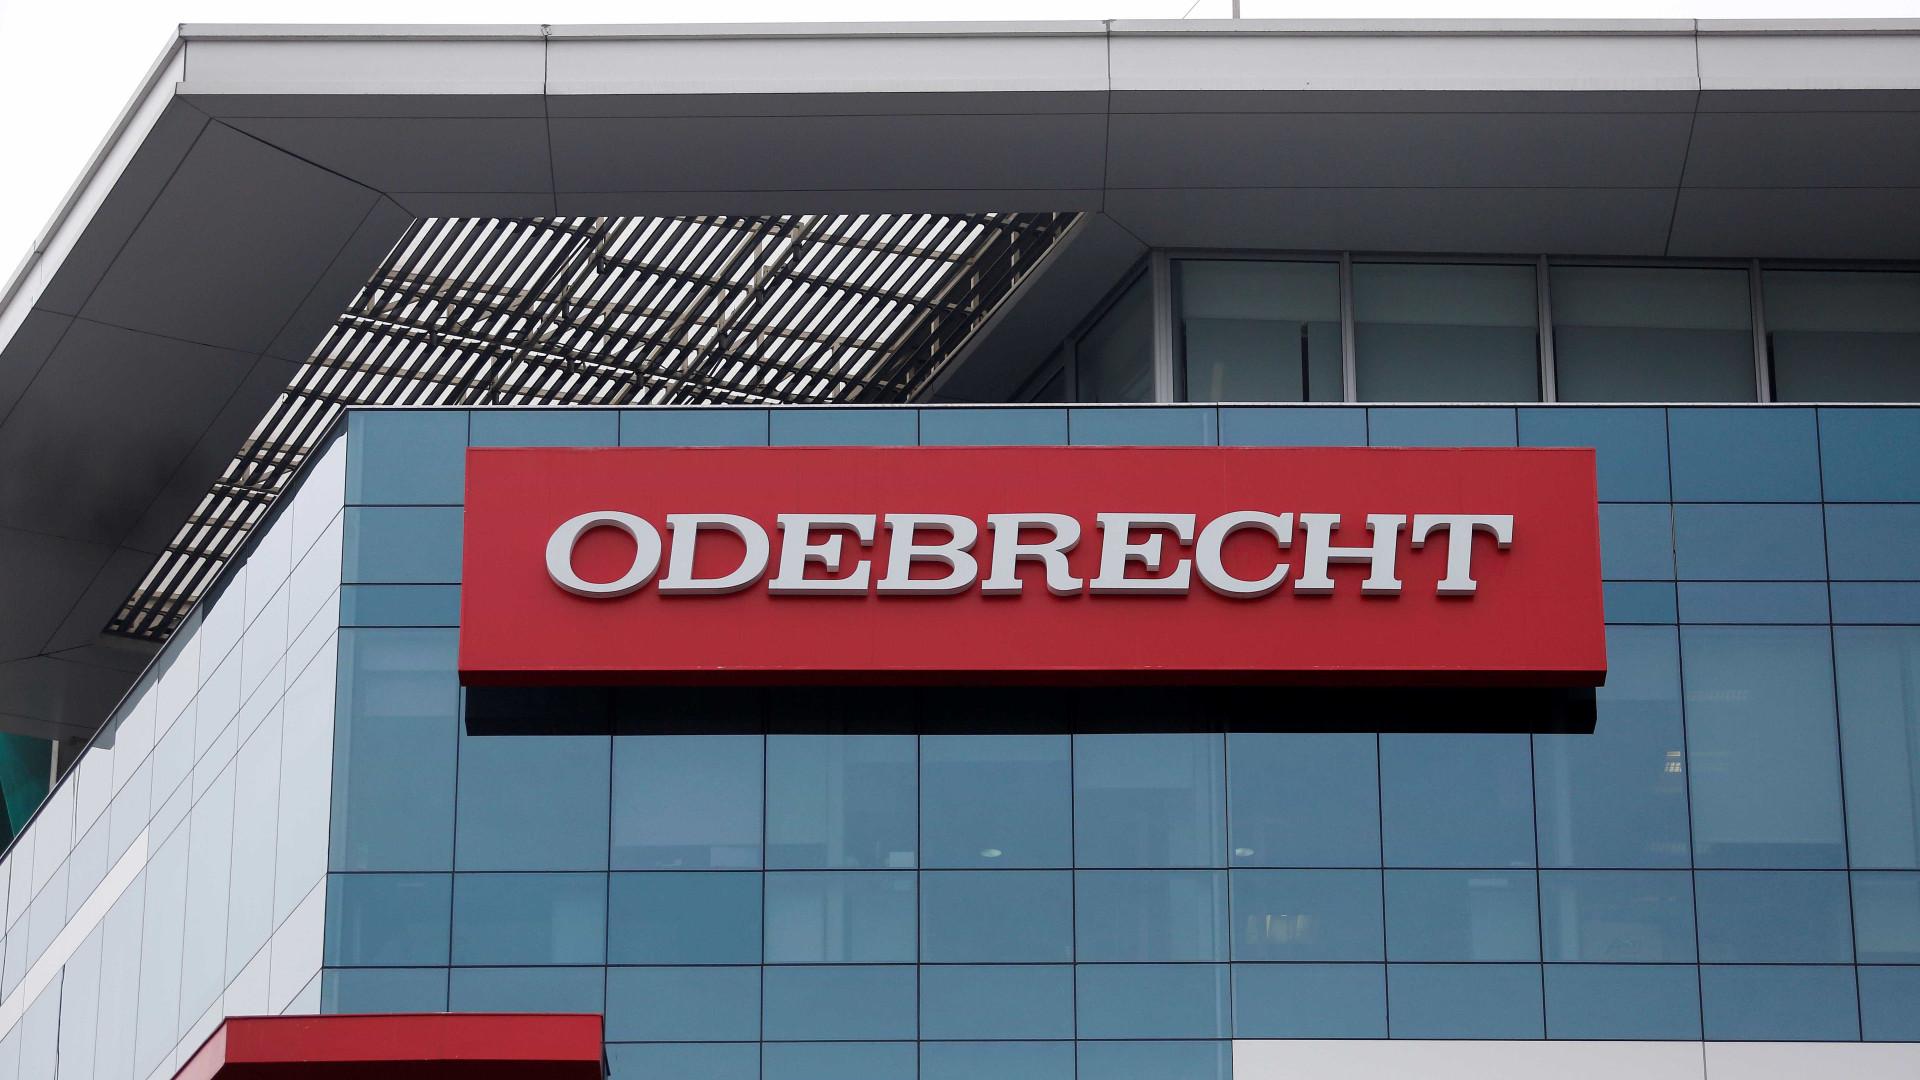 Compra de MPs continuou após Lava Jato, diz Odebrecht